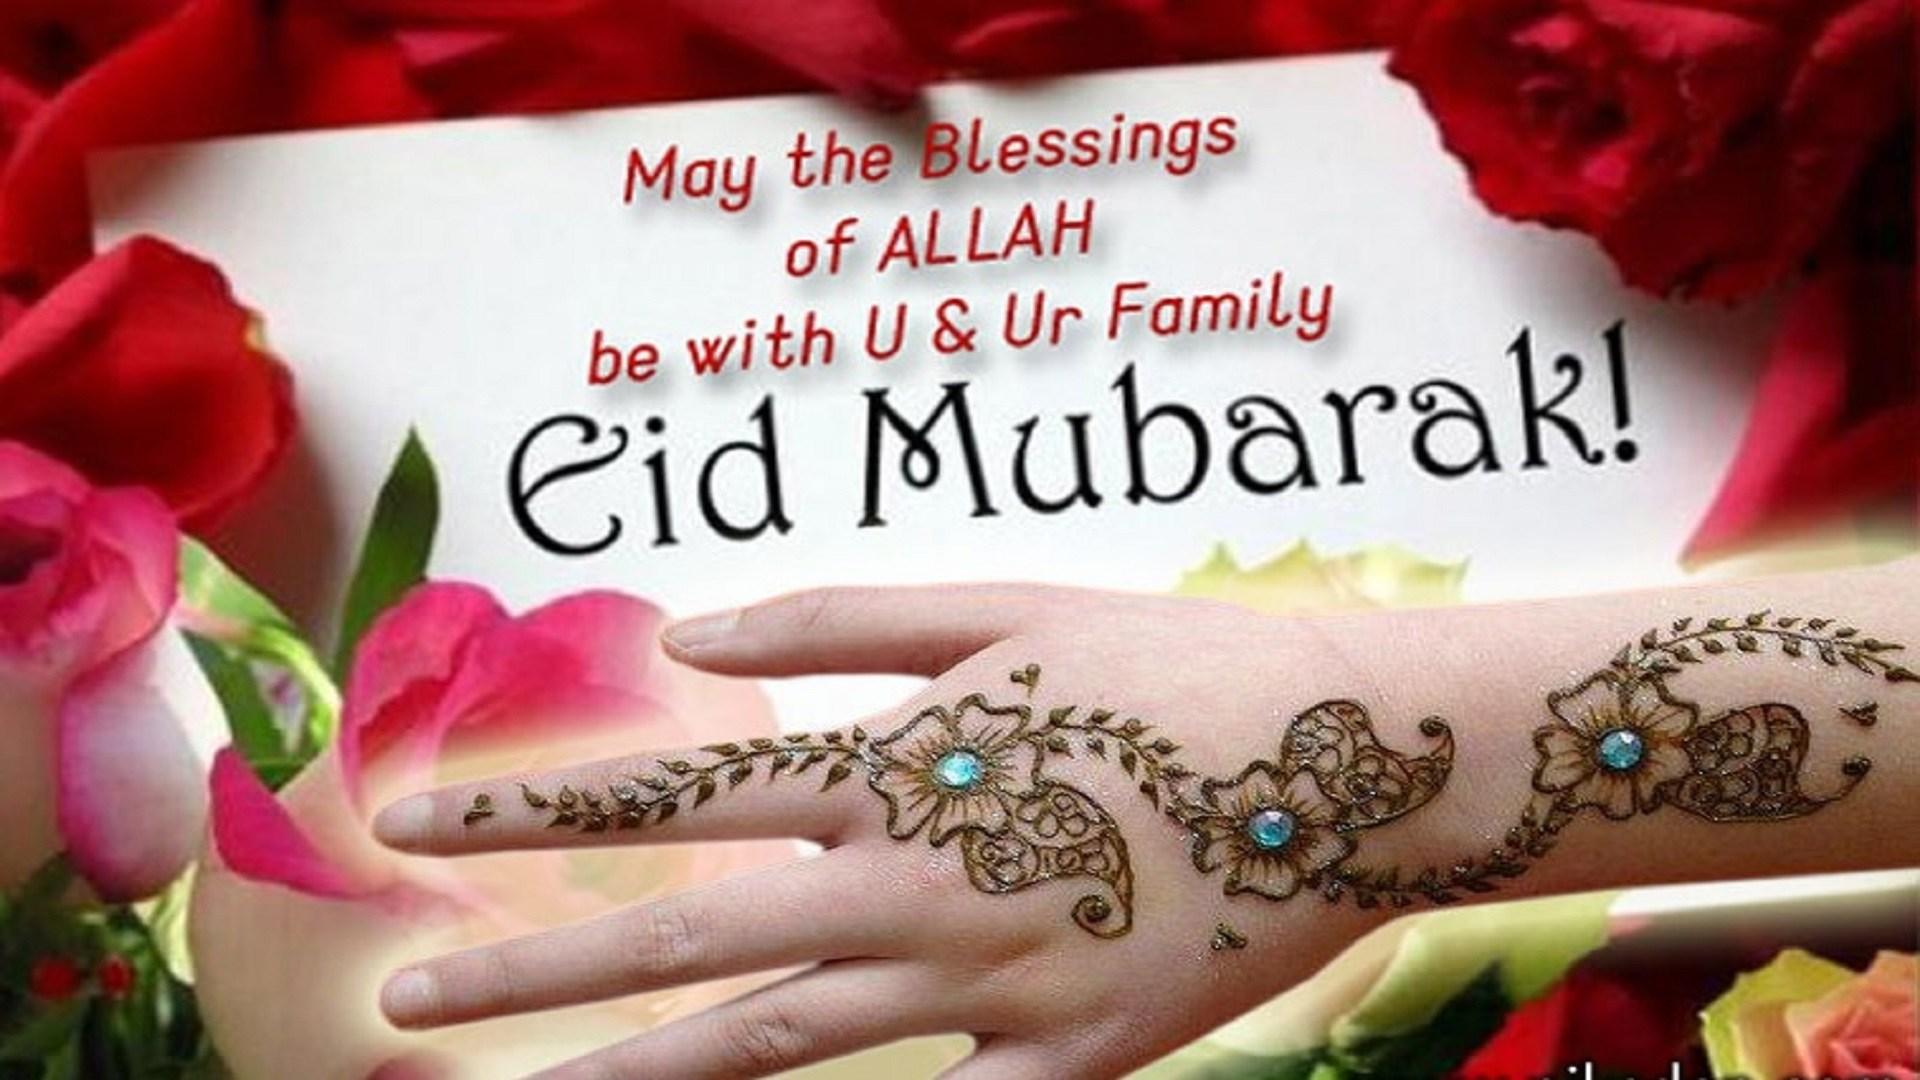 Eid Mubarak Images For Desktop